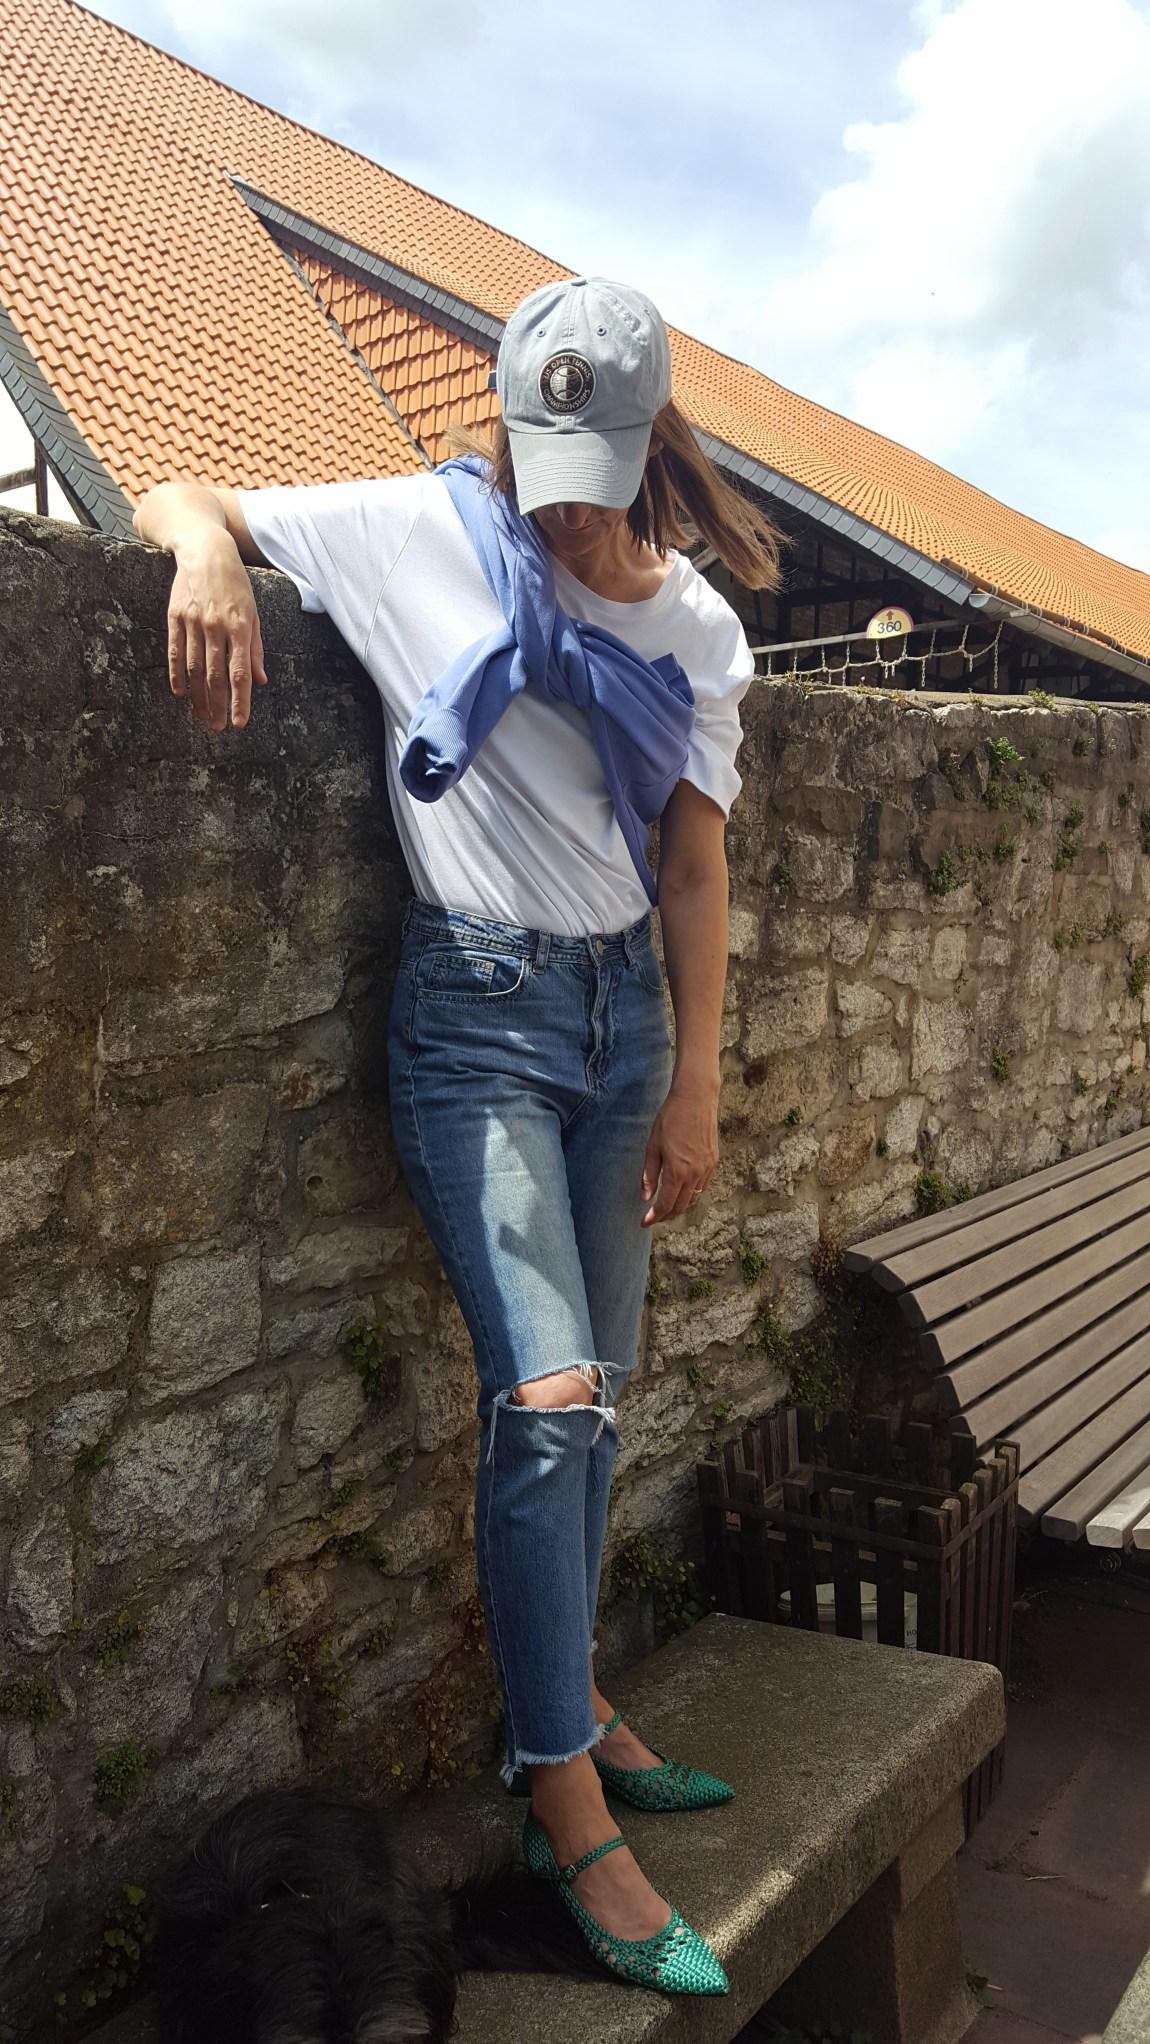 Rattan-Schuhe_jeans-destroyed_weekday_sweatshirt-blau_casual-look_schloss-salder_mode-blog_frau_ü40_oceanblue-style_bulgari_tasche-gruen (17)